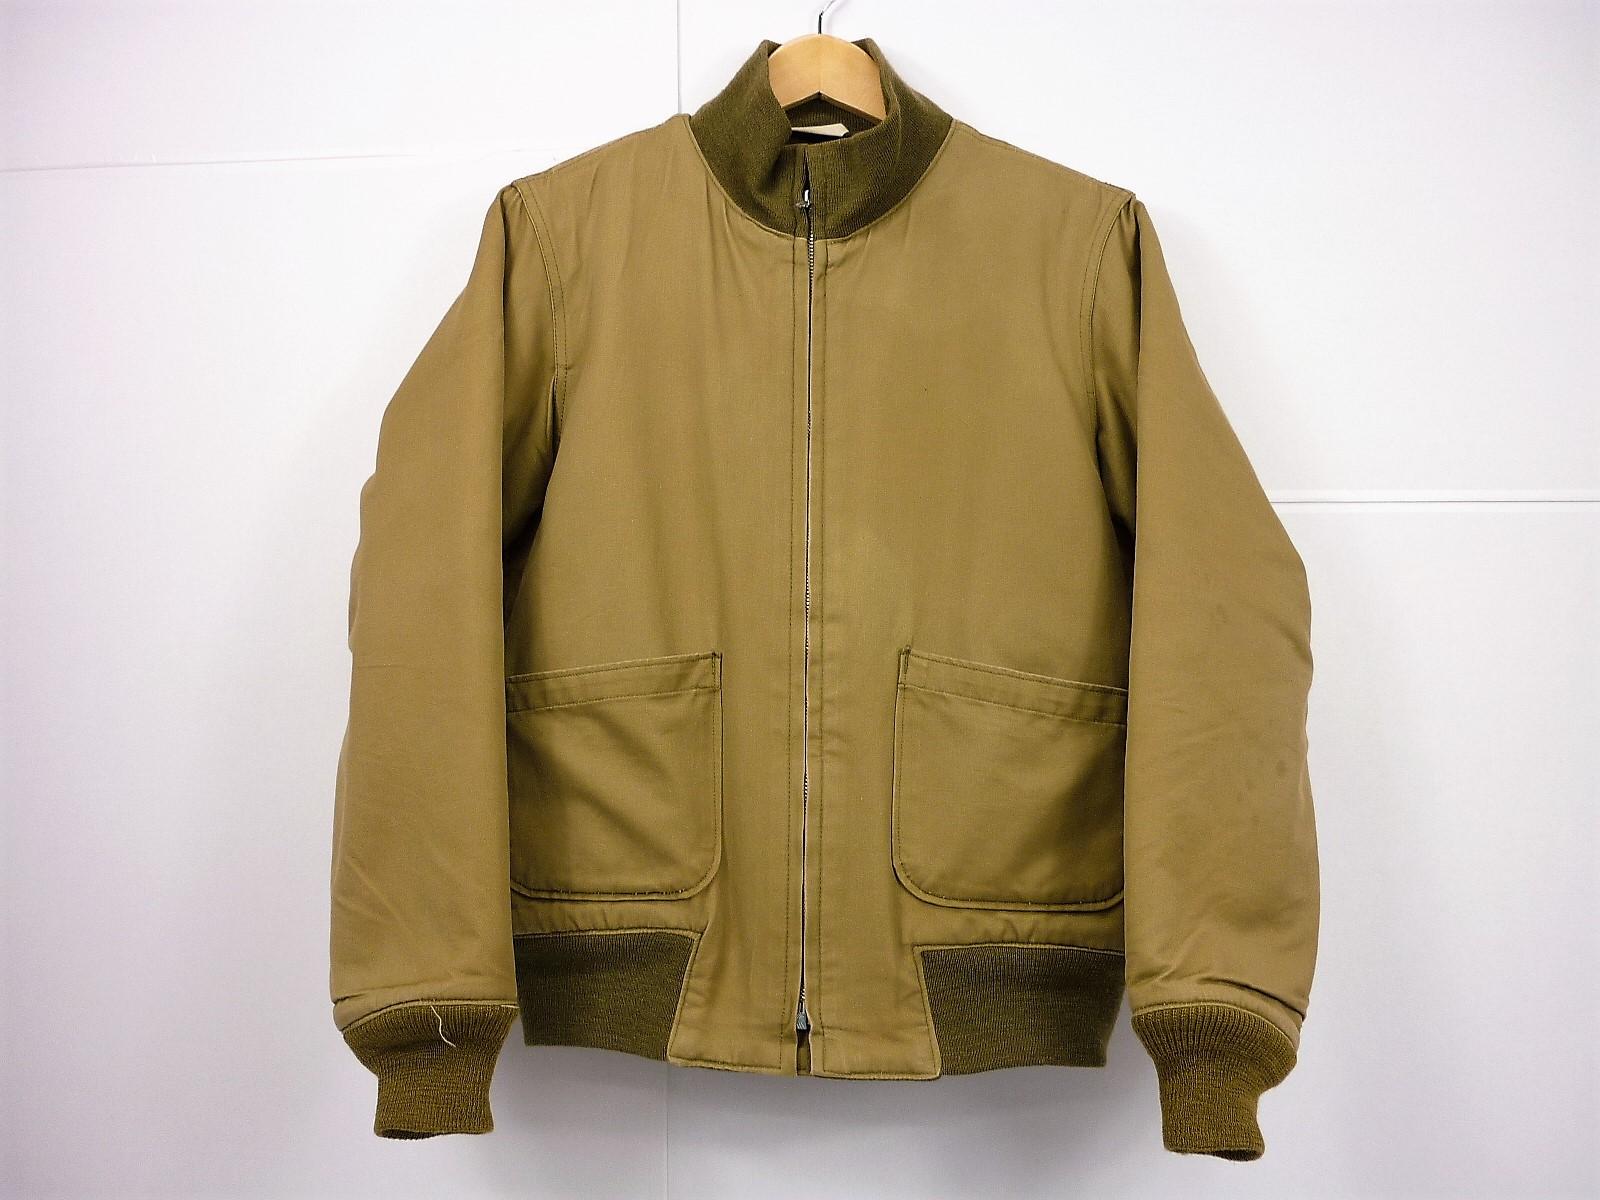 REAL McCOY's タンカース ジャケット size:S リアルマッコイズ カーキ WINTER COMBAT